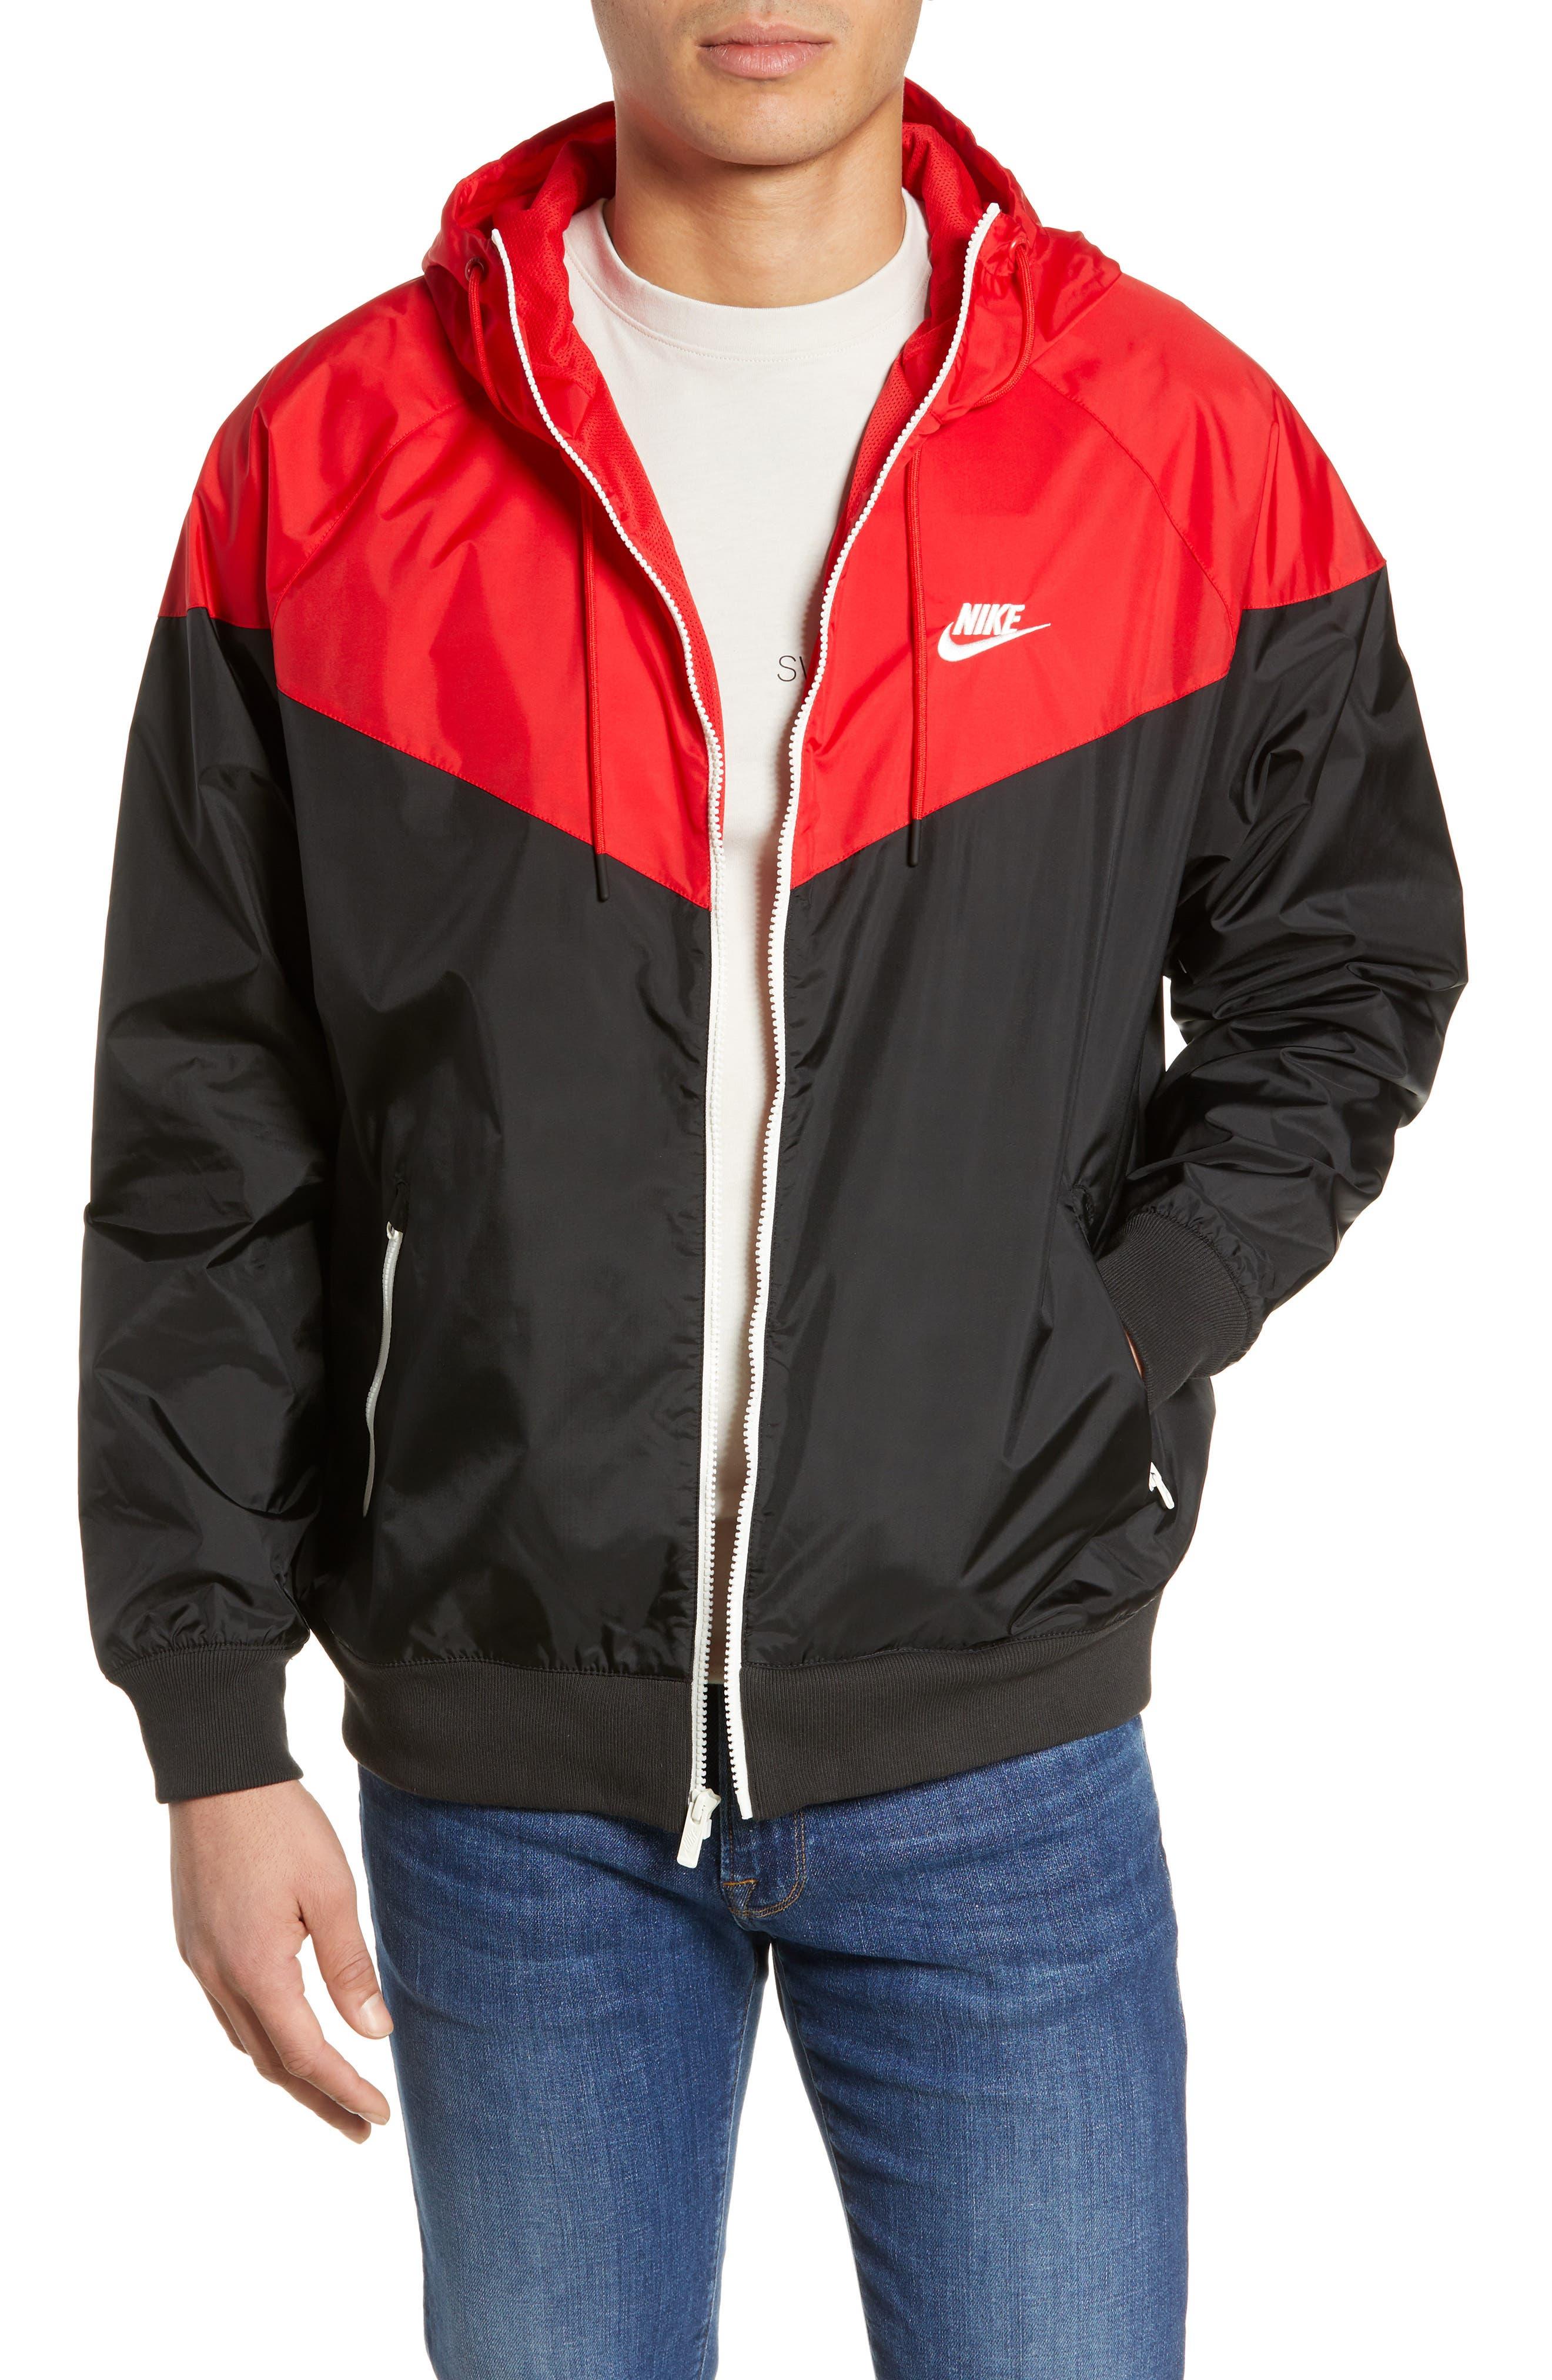 NIKE, Sportswear Windrunner Jacket, Main thumbnail 1, color, 011